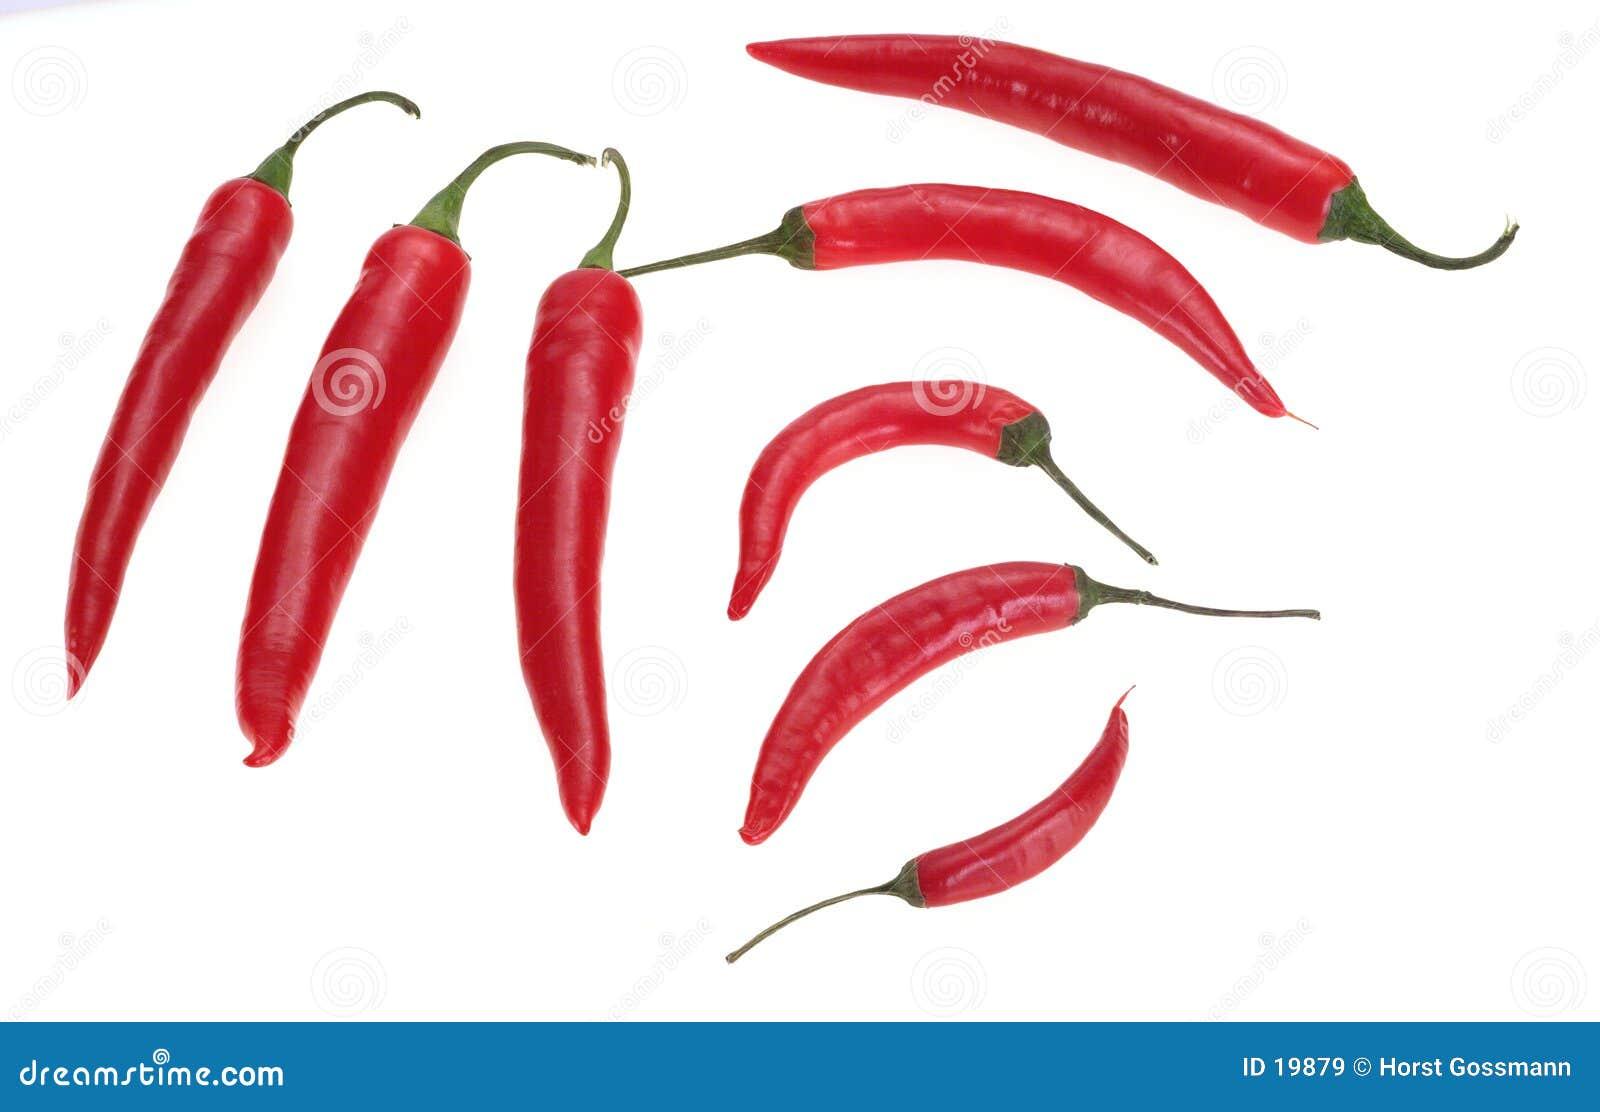 Pimenta 2